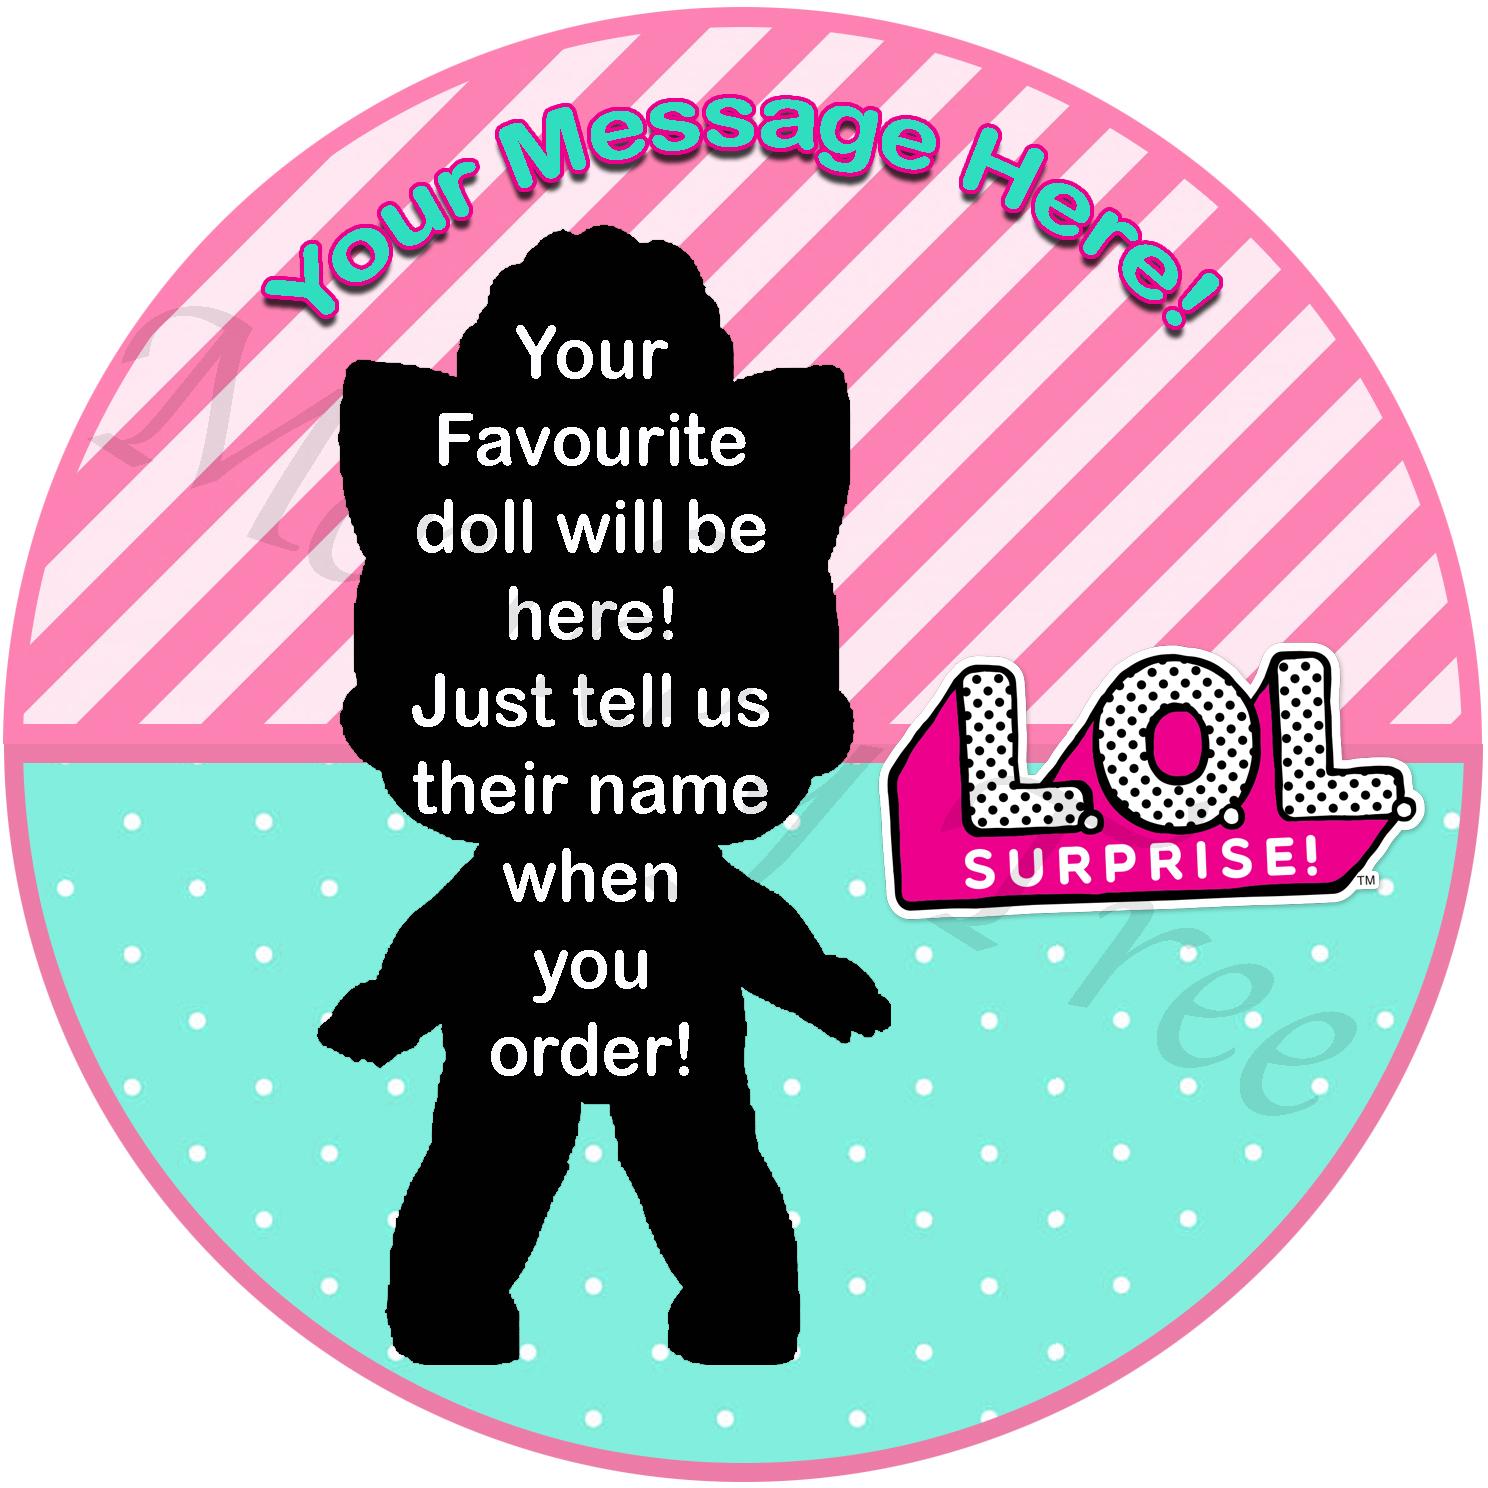 lol suprise doll edible image topper cake cupcake party confetti pop